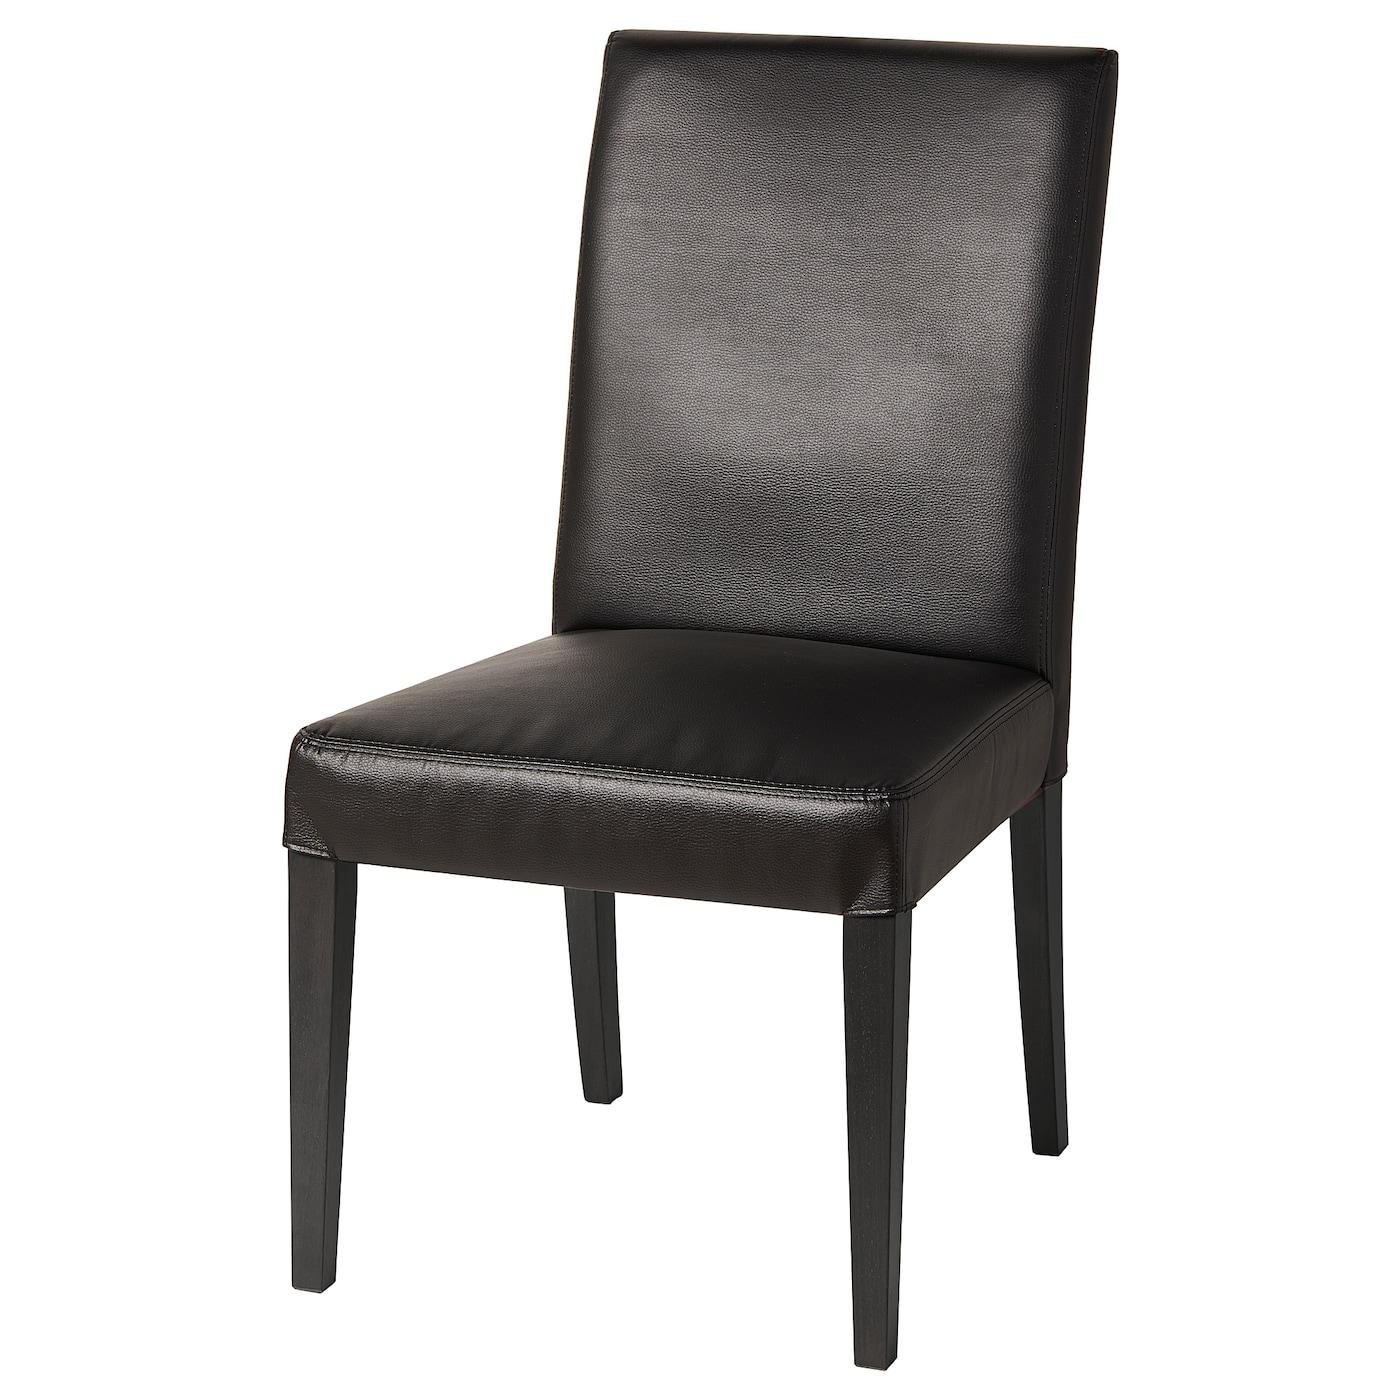 HENRIKSDAL Chair - black, Bomstad black - IKEA